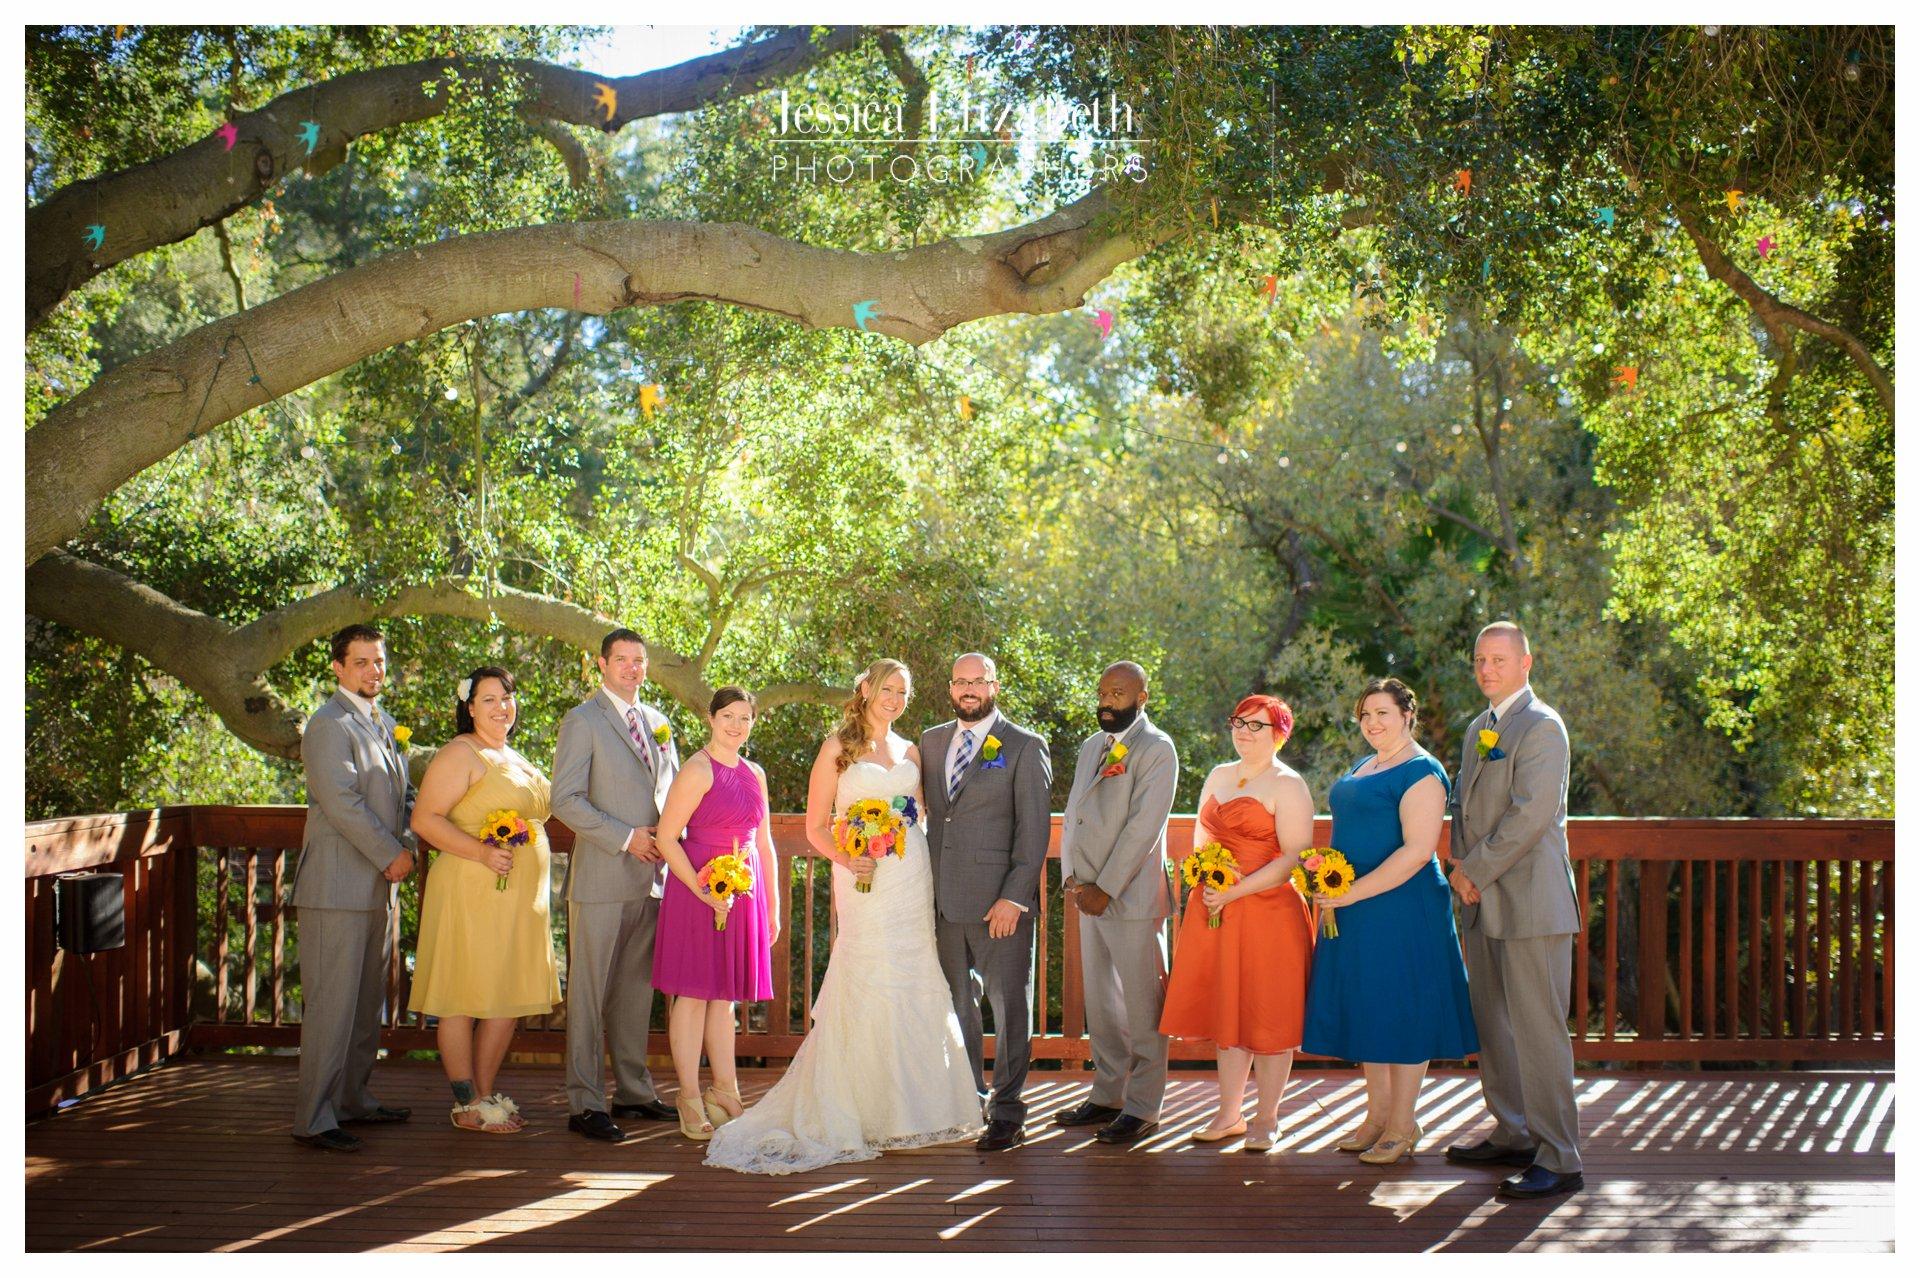 17-The-1909-Malibu-Wedding-photography-by-Jessica-Elizabeth-w.jpg